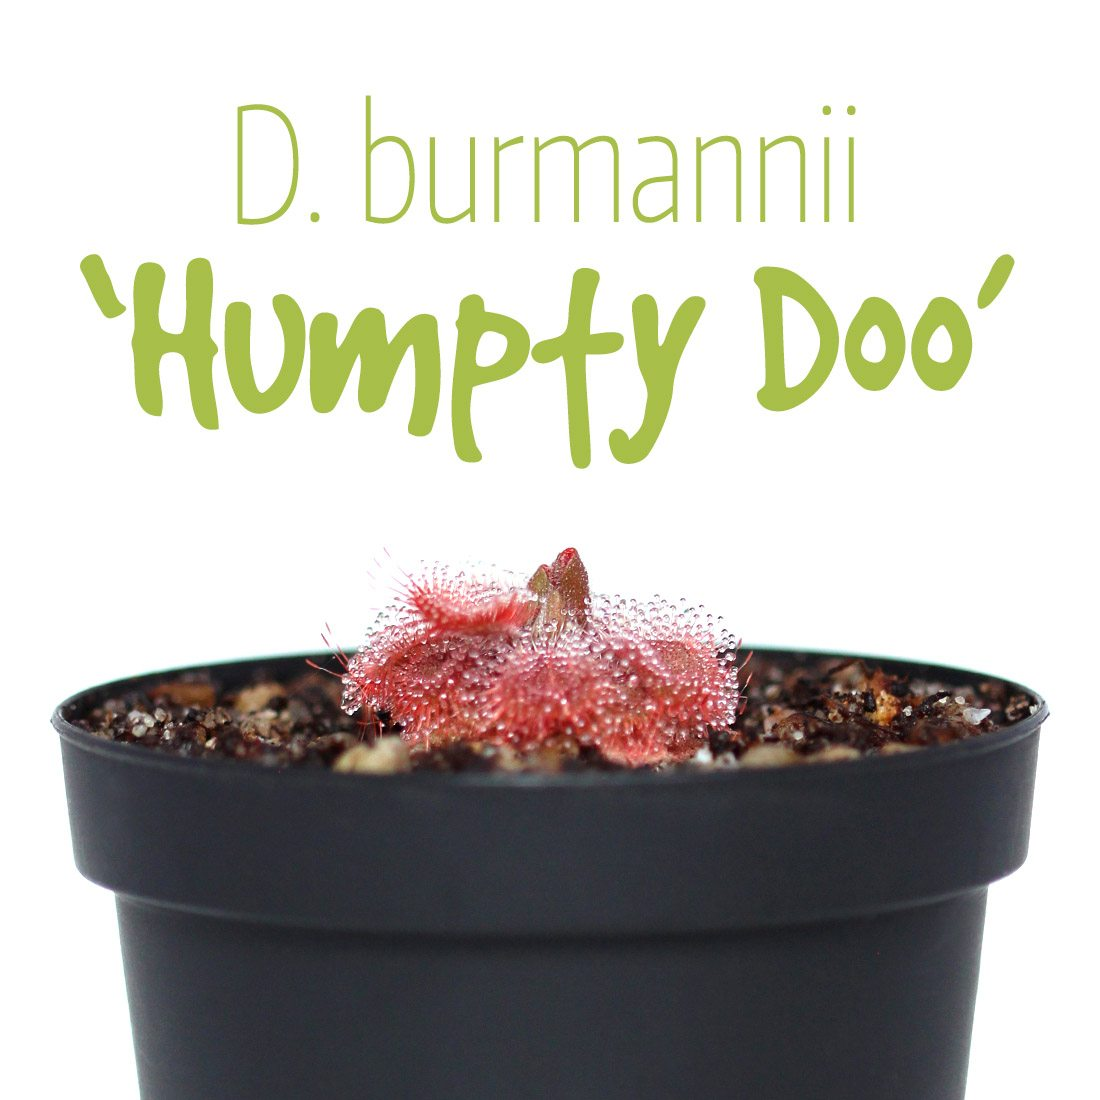 Drosera burmannii 'Humpty Doo'